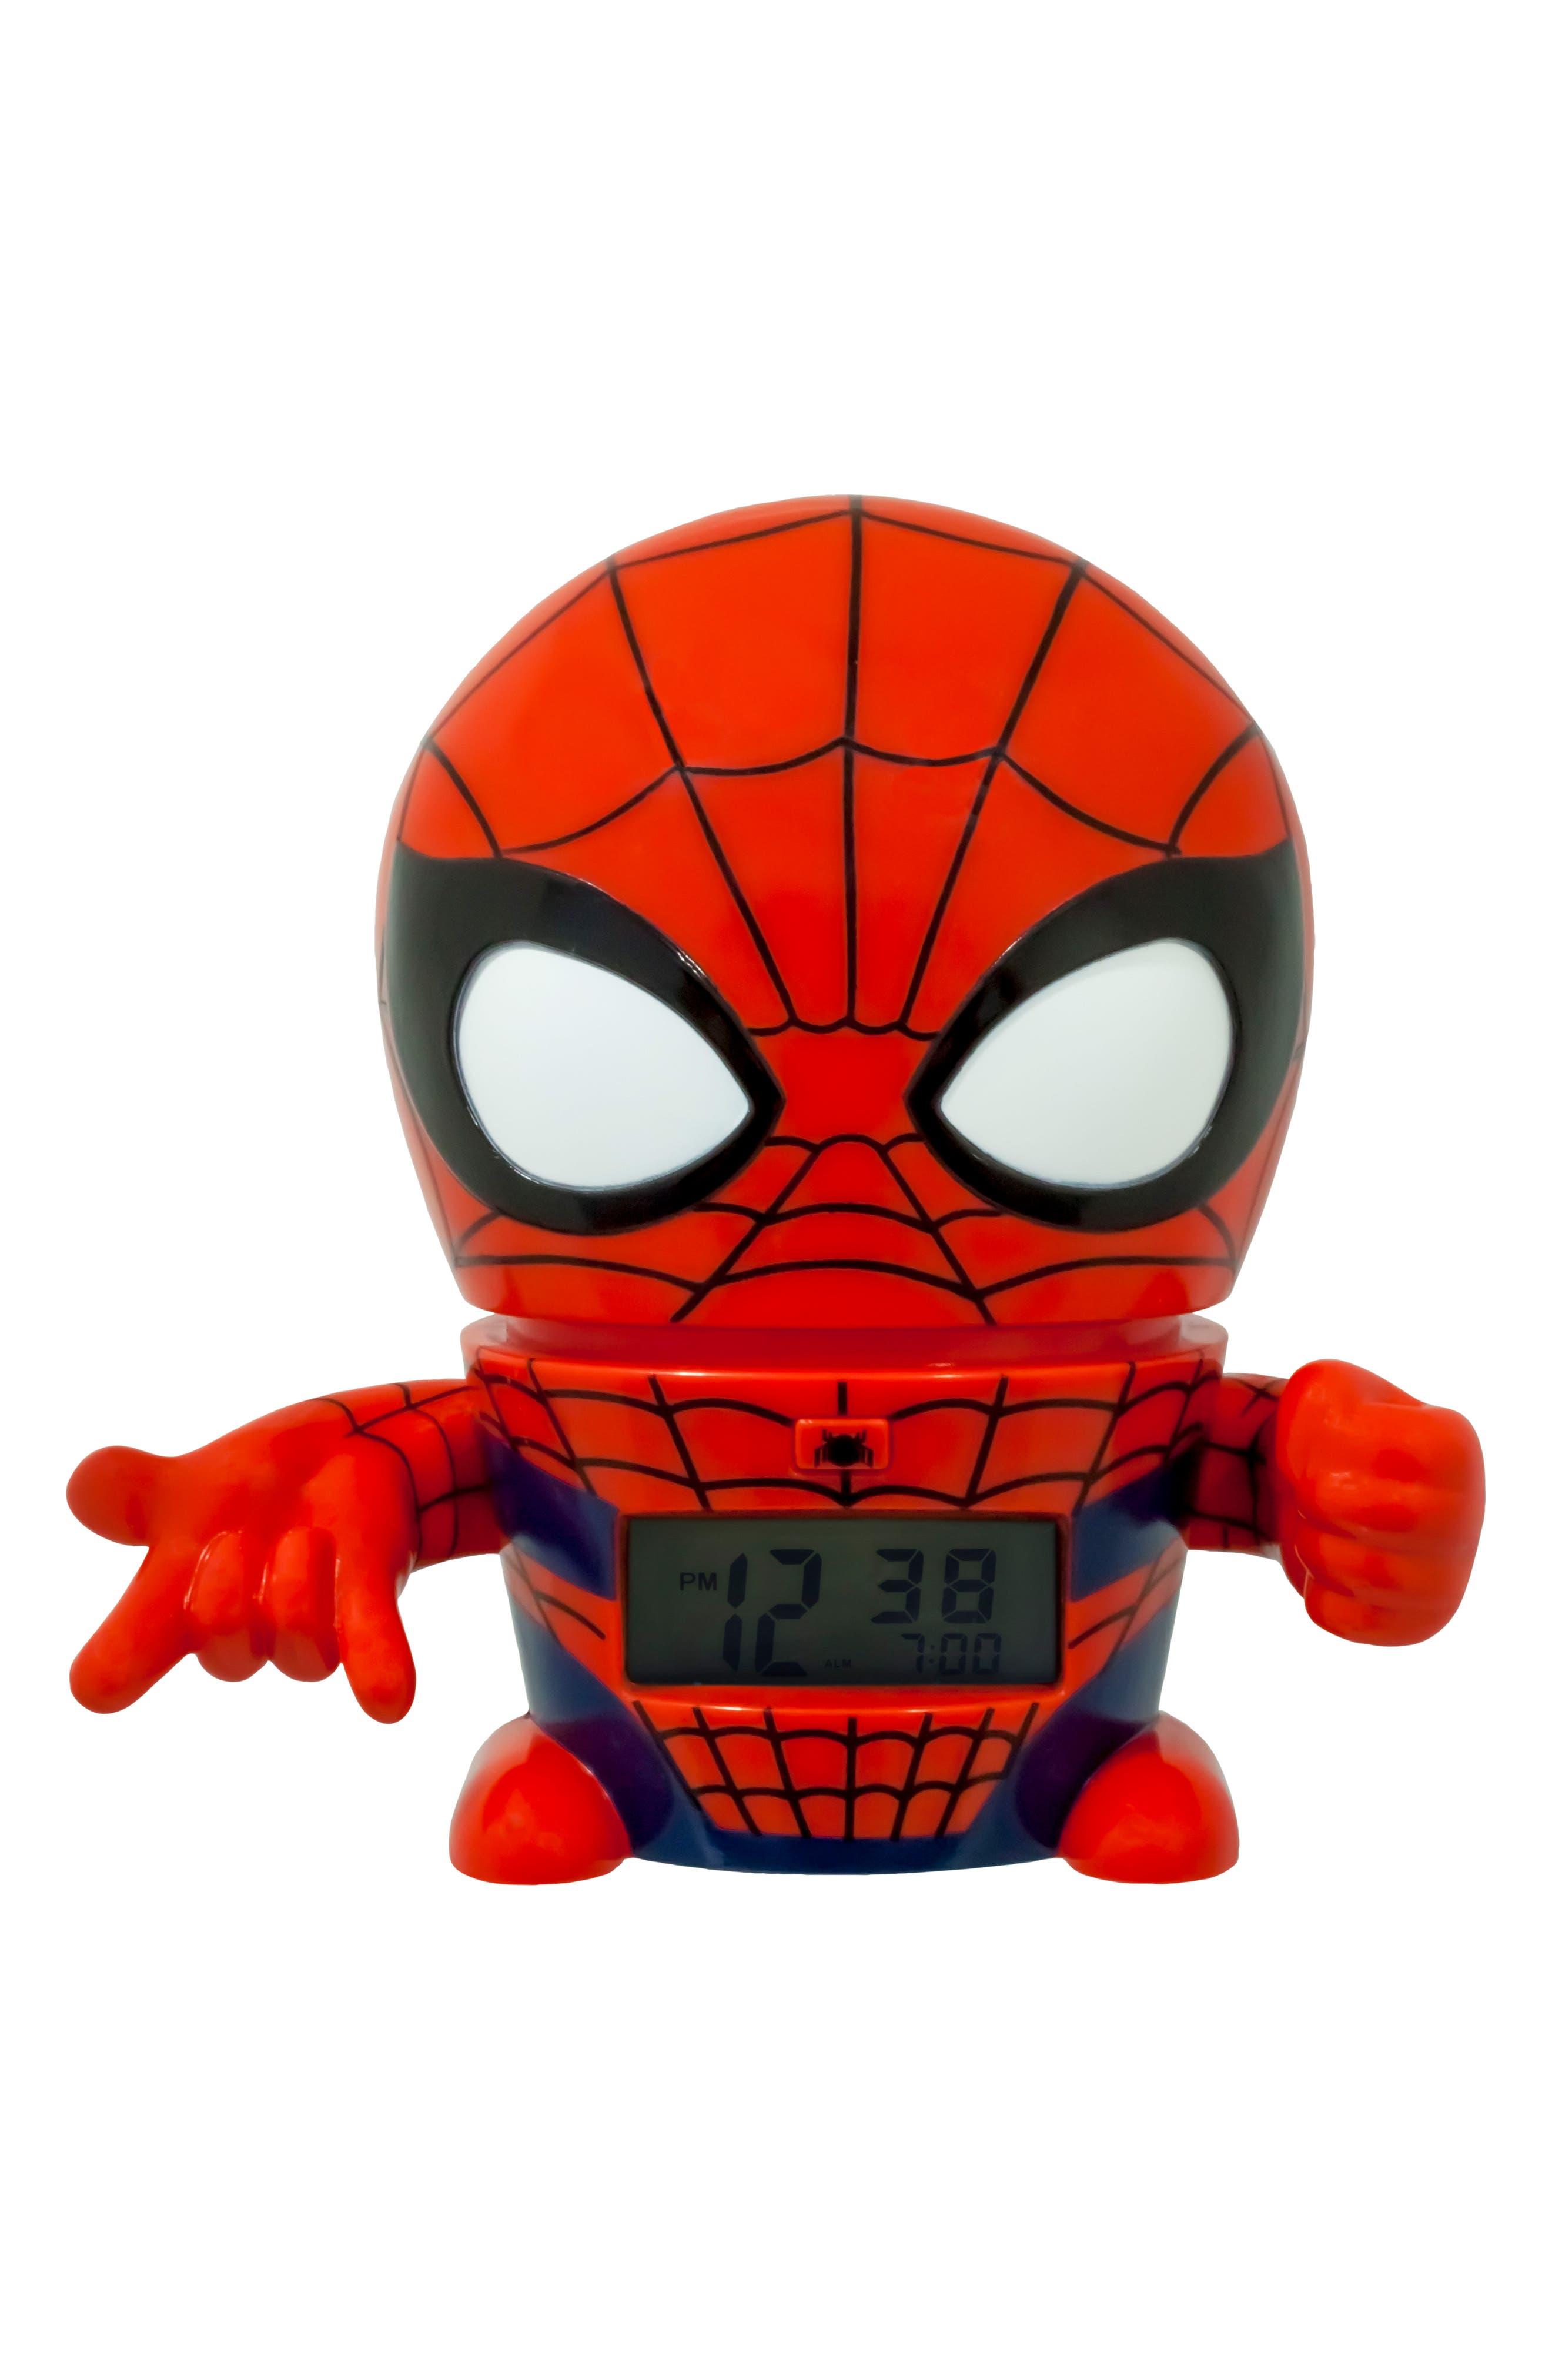 Alternate Image 1 Selected - Bulb Botz Marvel Spider-Man Night-Light/Alarm Clock